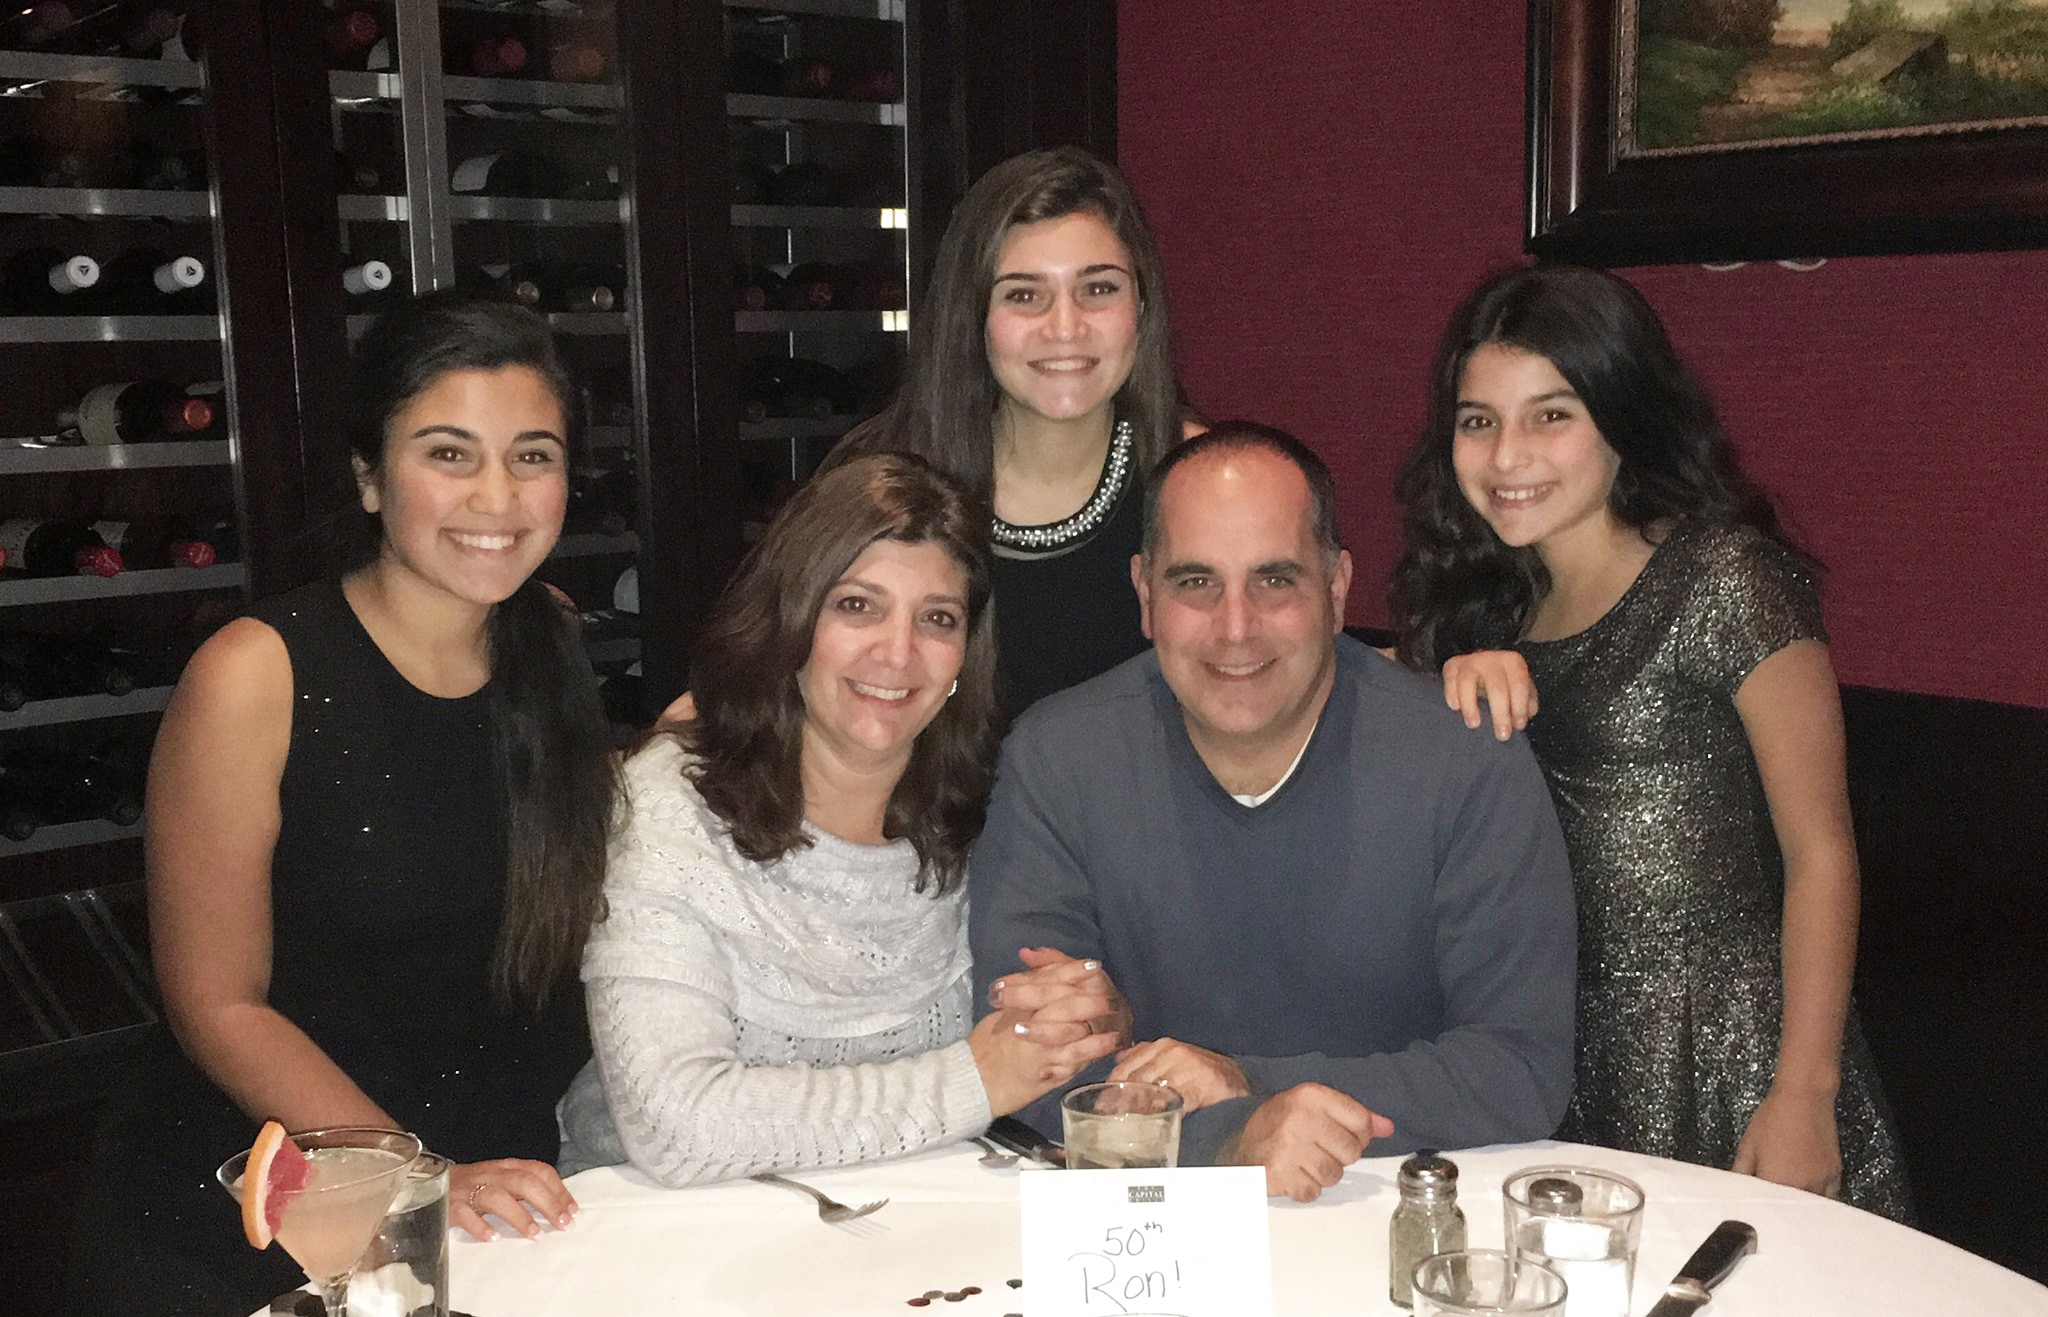 The D'Amato Family